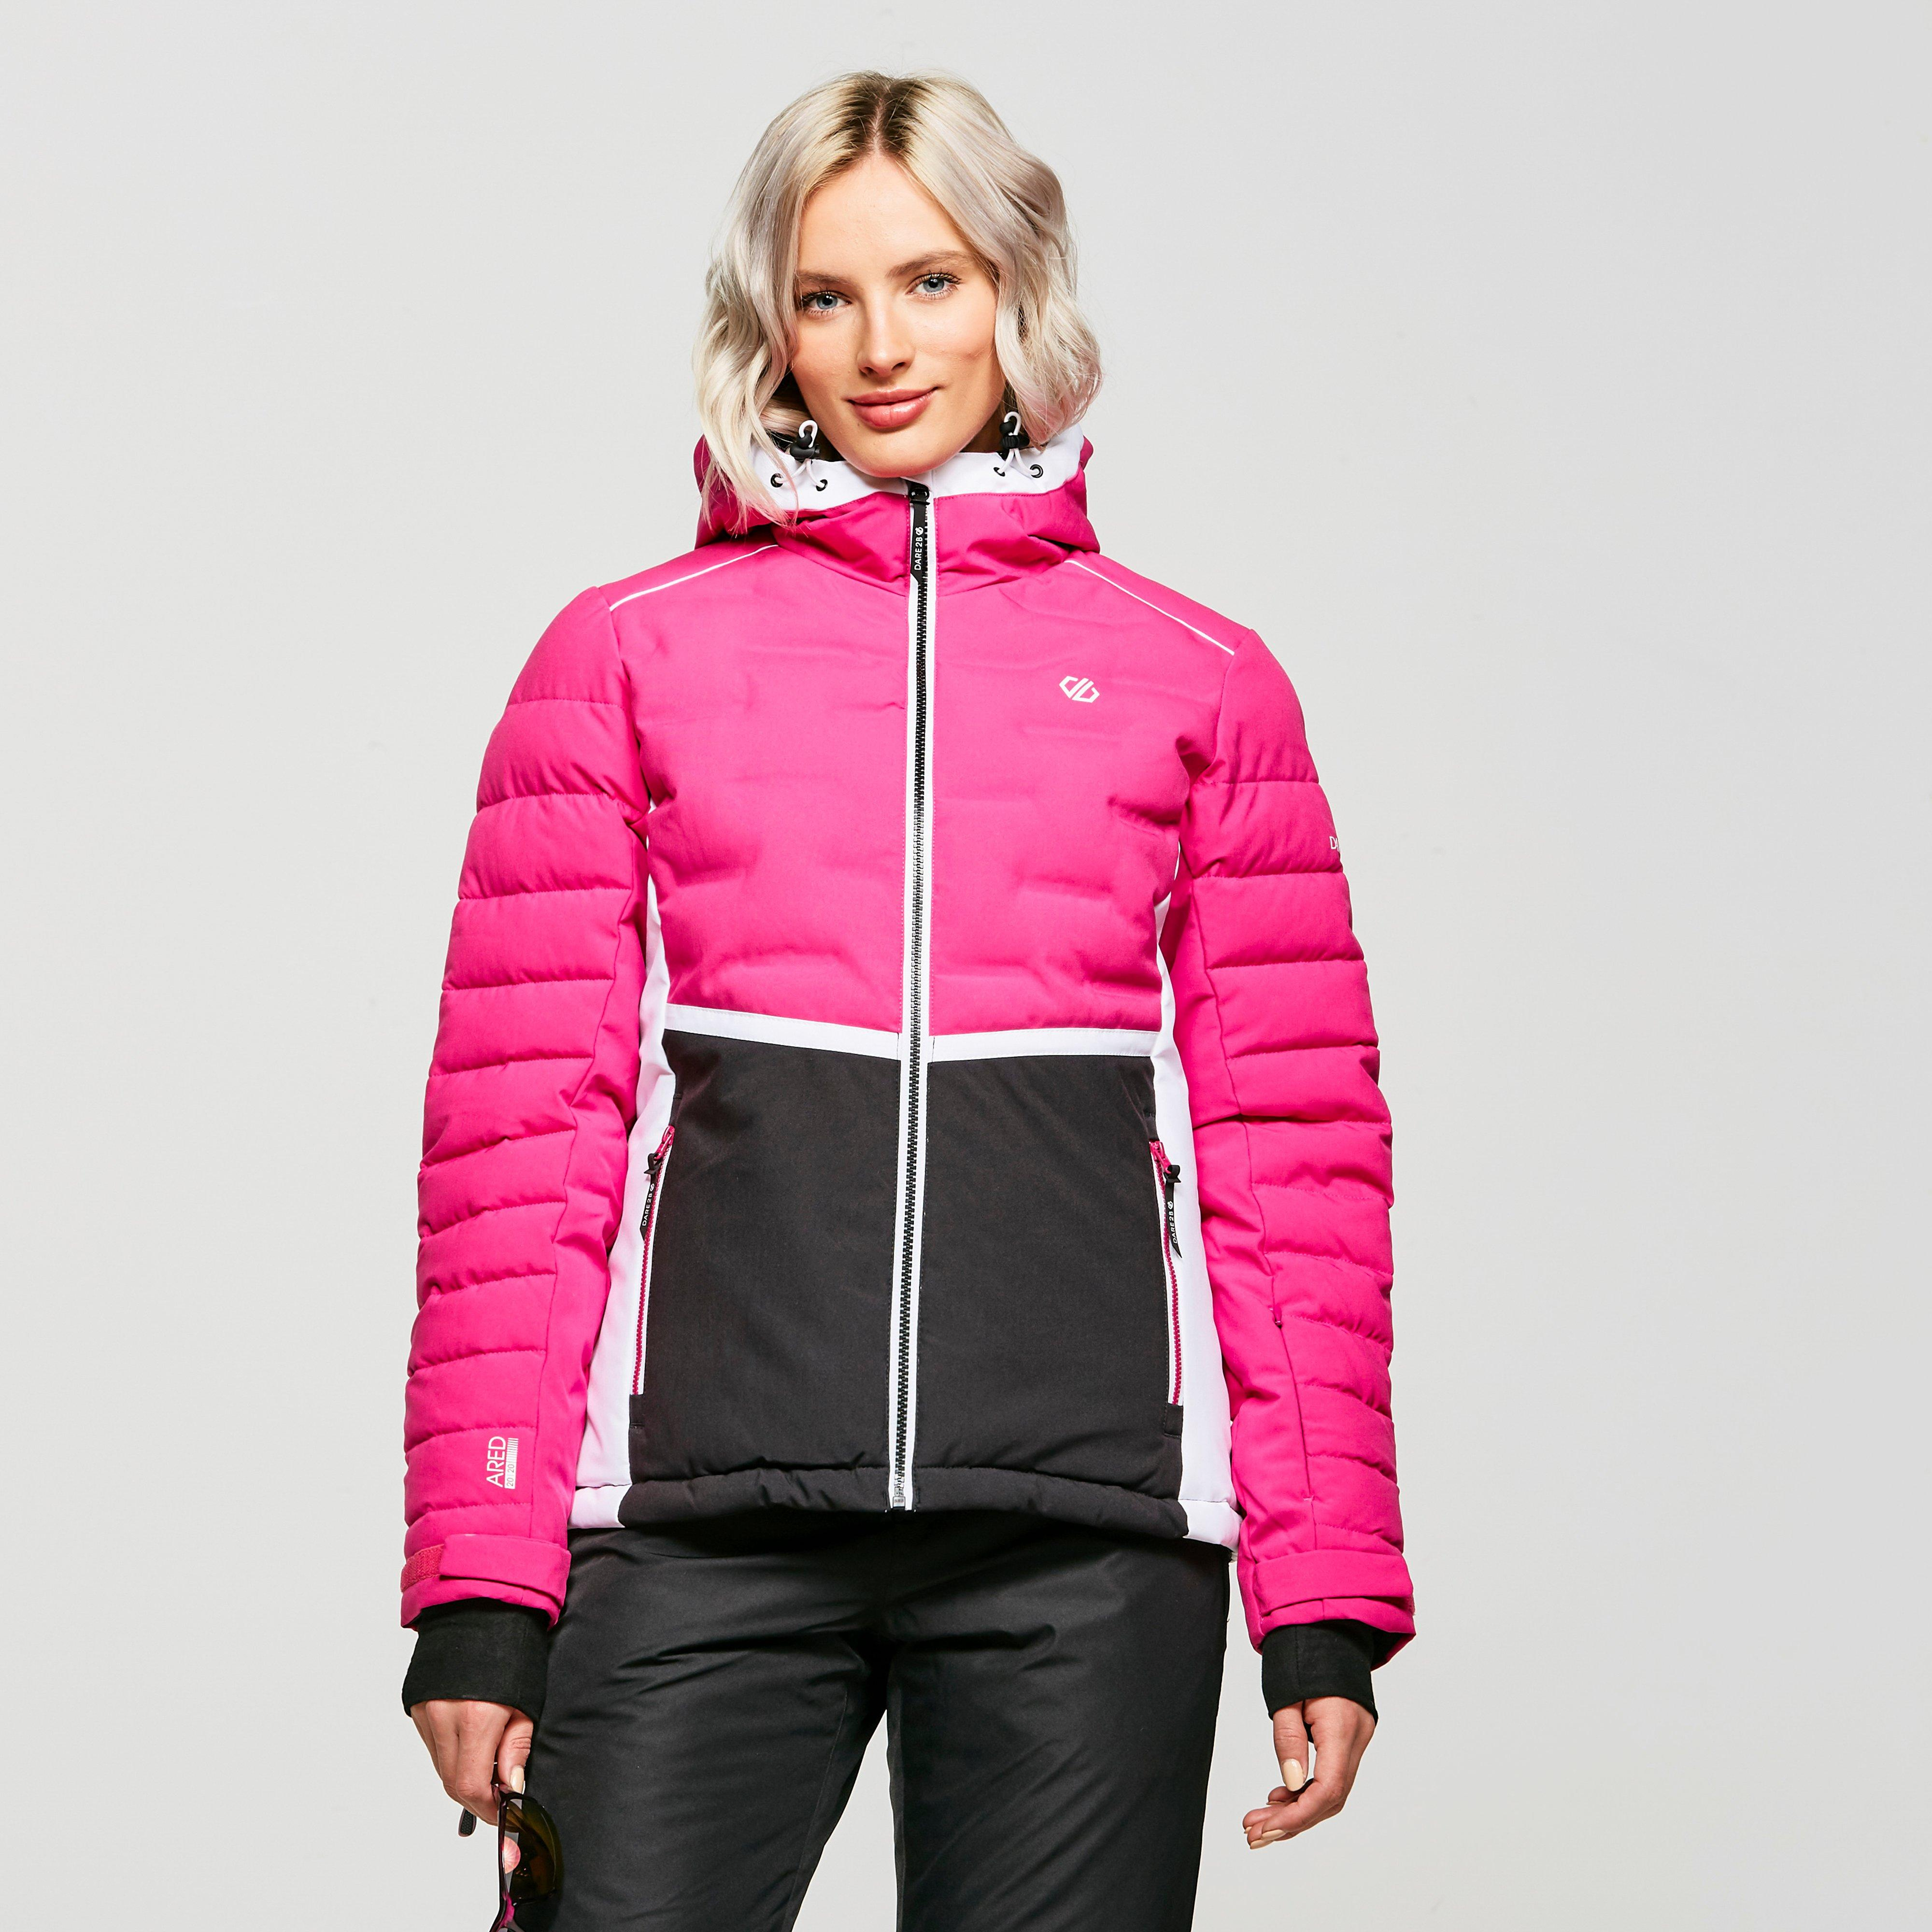 Dare 2B Women's Vividly Waterproof Insulated Ski Jacket - Pink/Pink, Pink